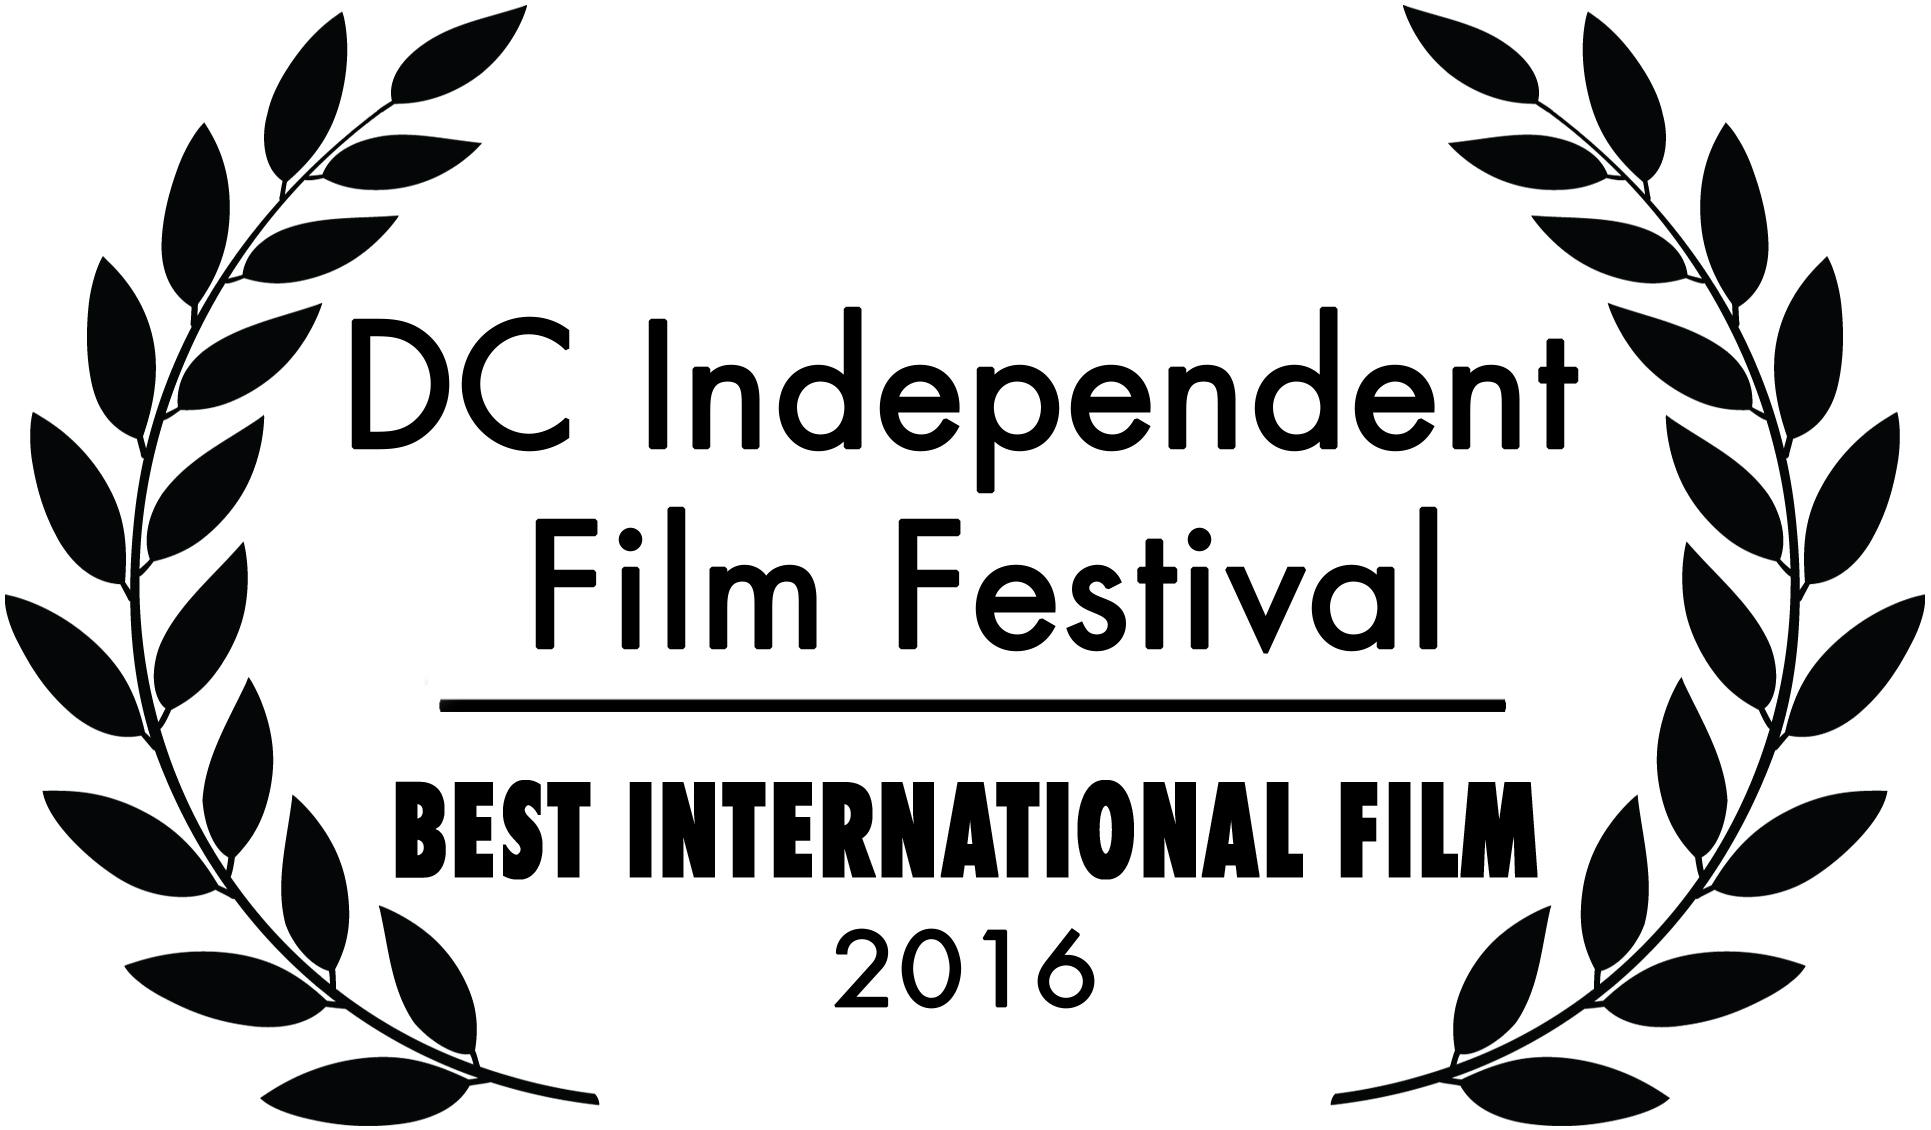 DCIFF_Laurel_BestInternationalFilm_2016